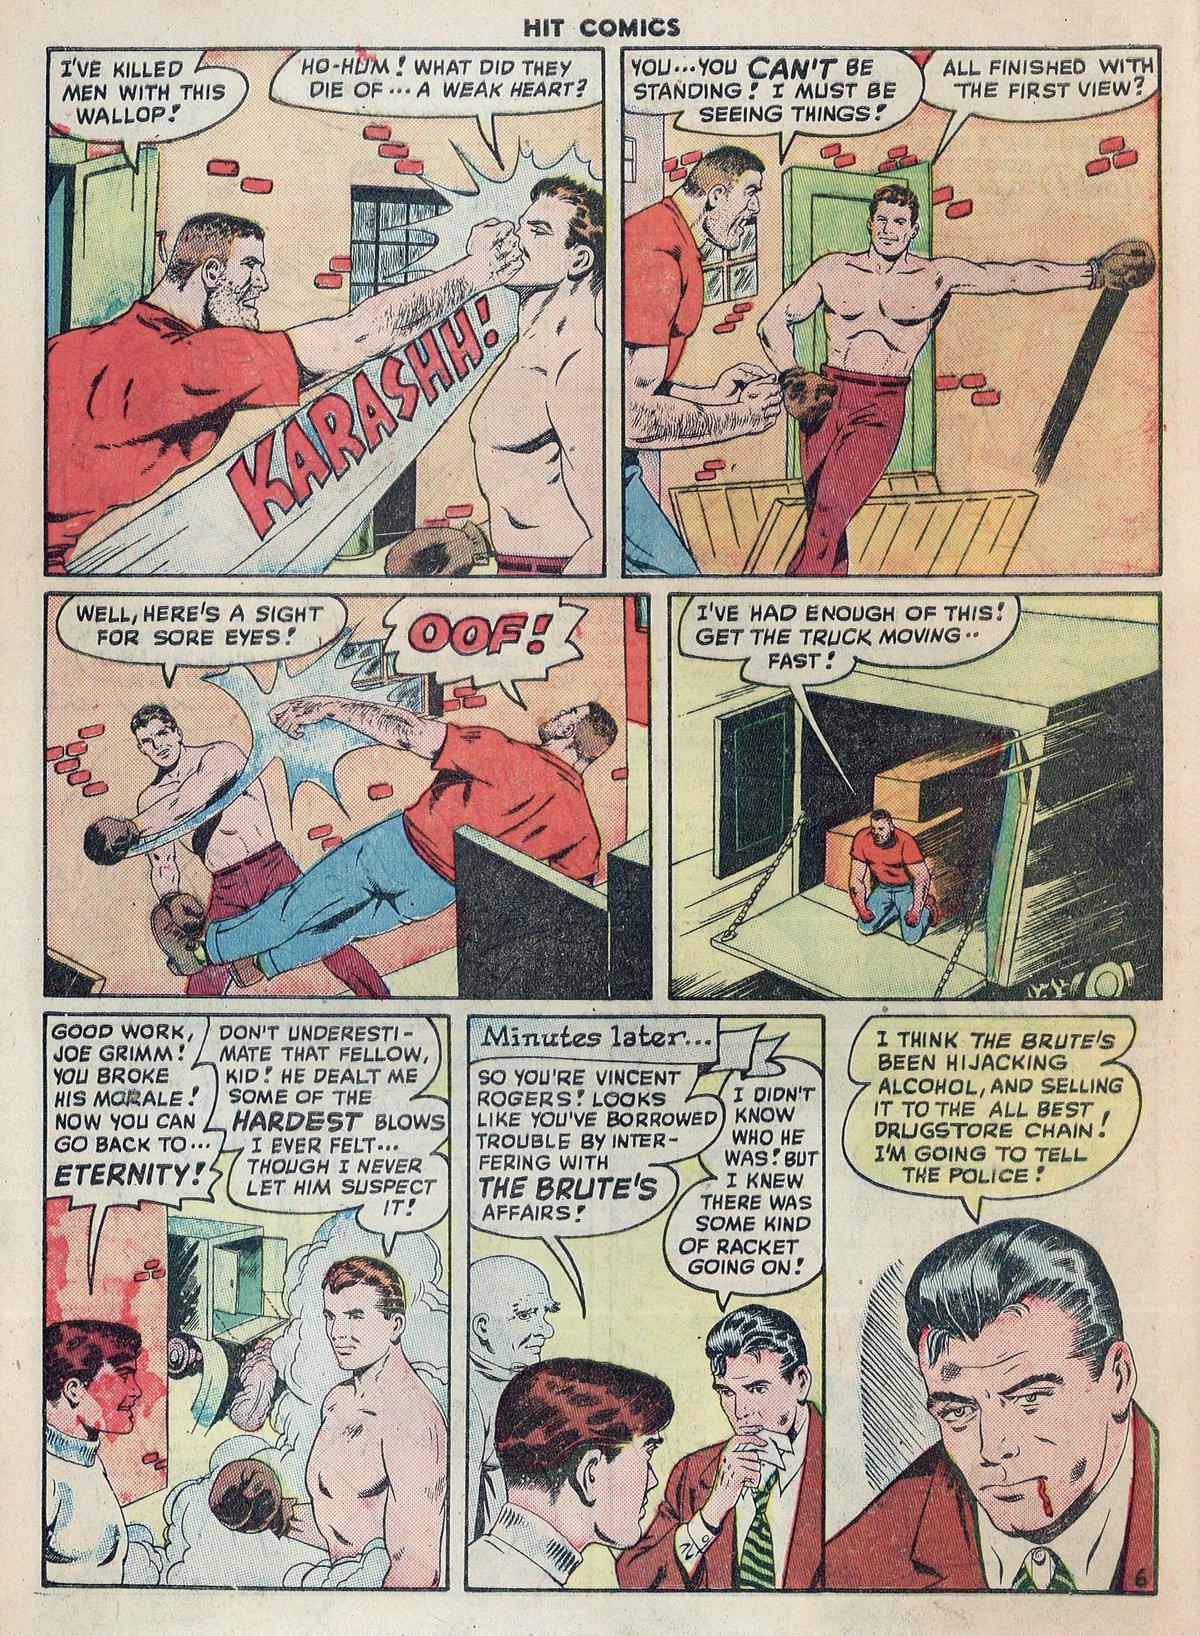 Read online Hit Comics comic -  Issue #55 - 8